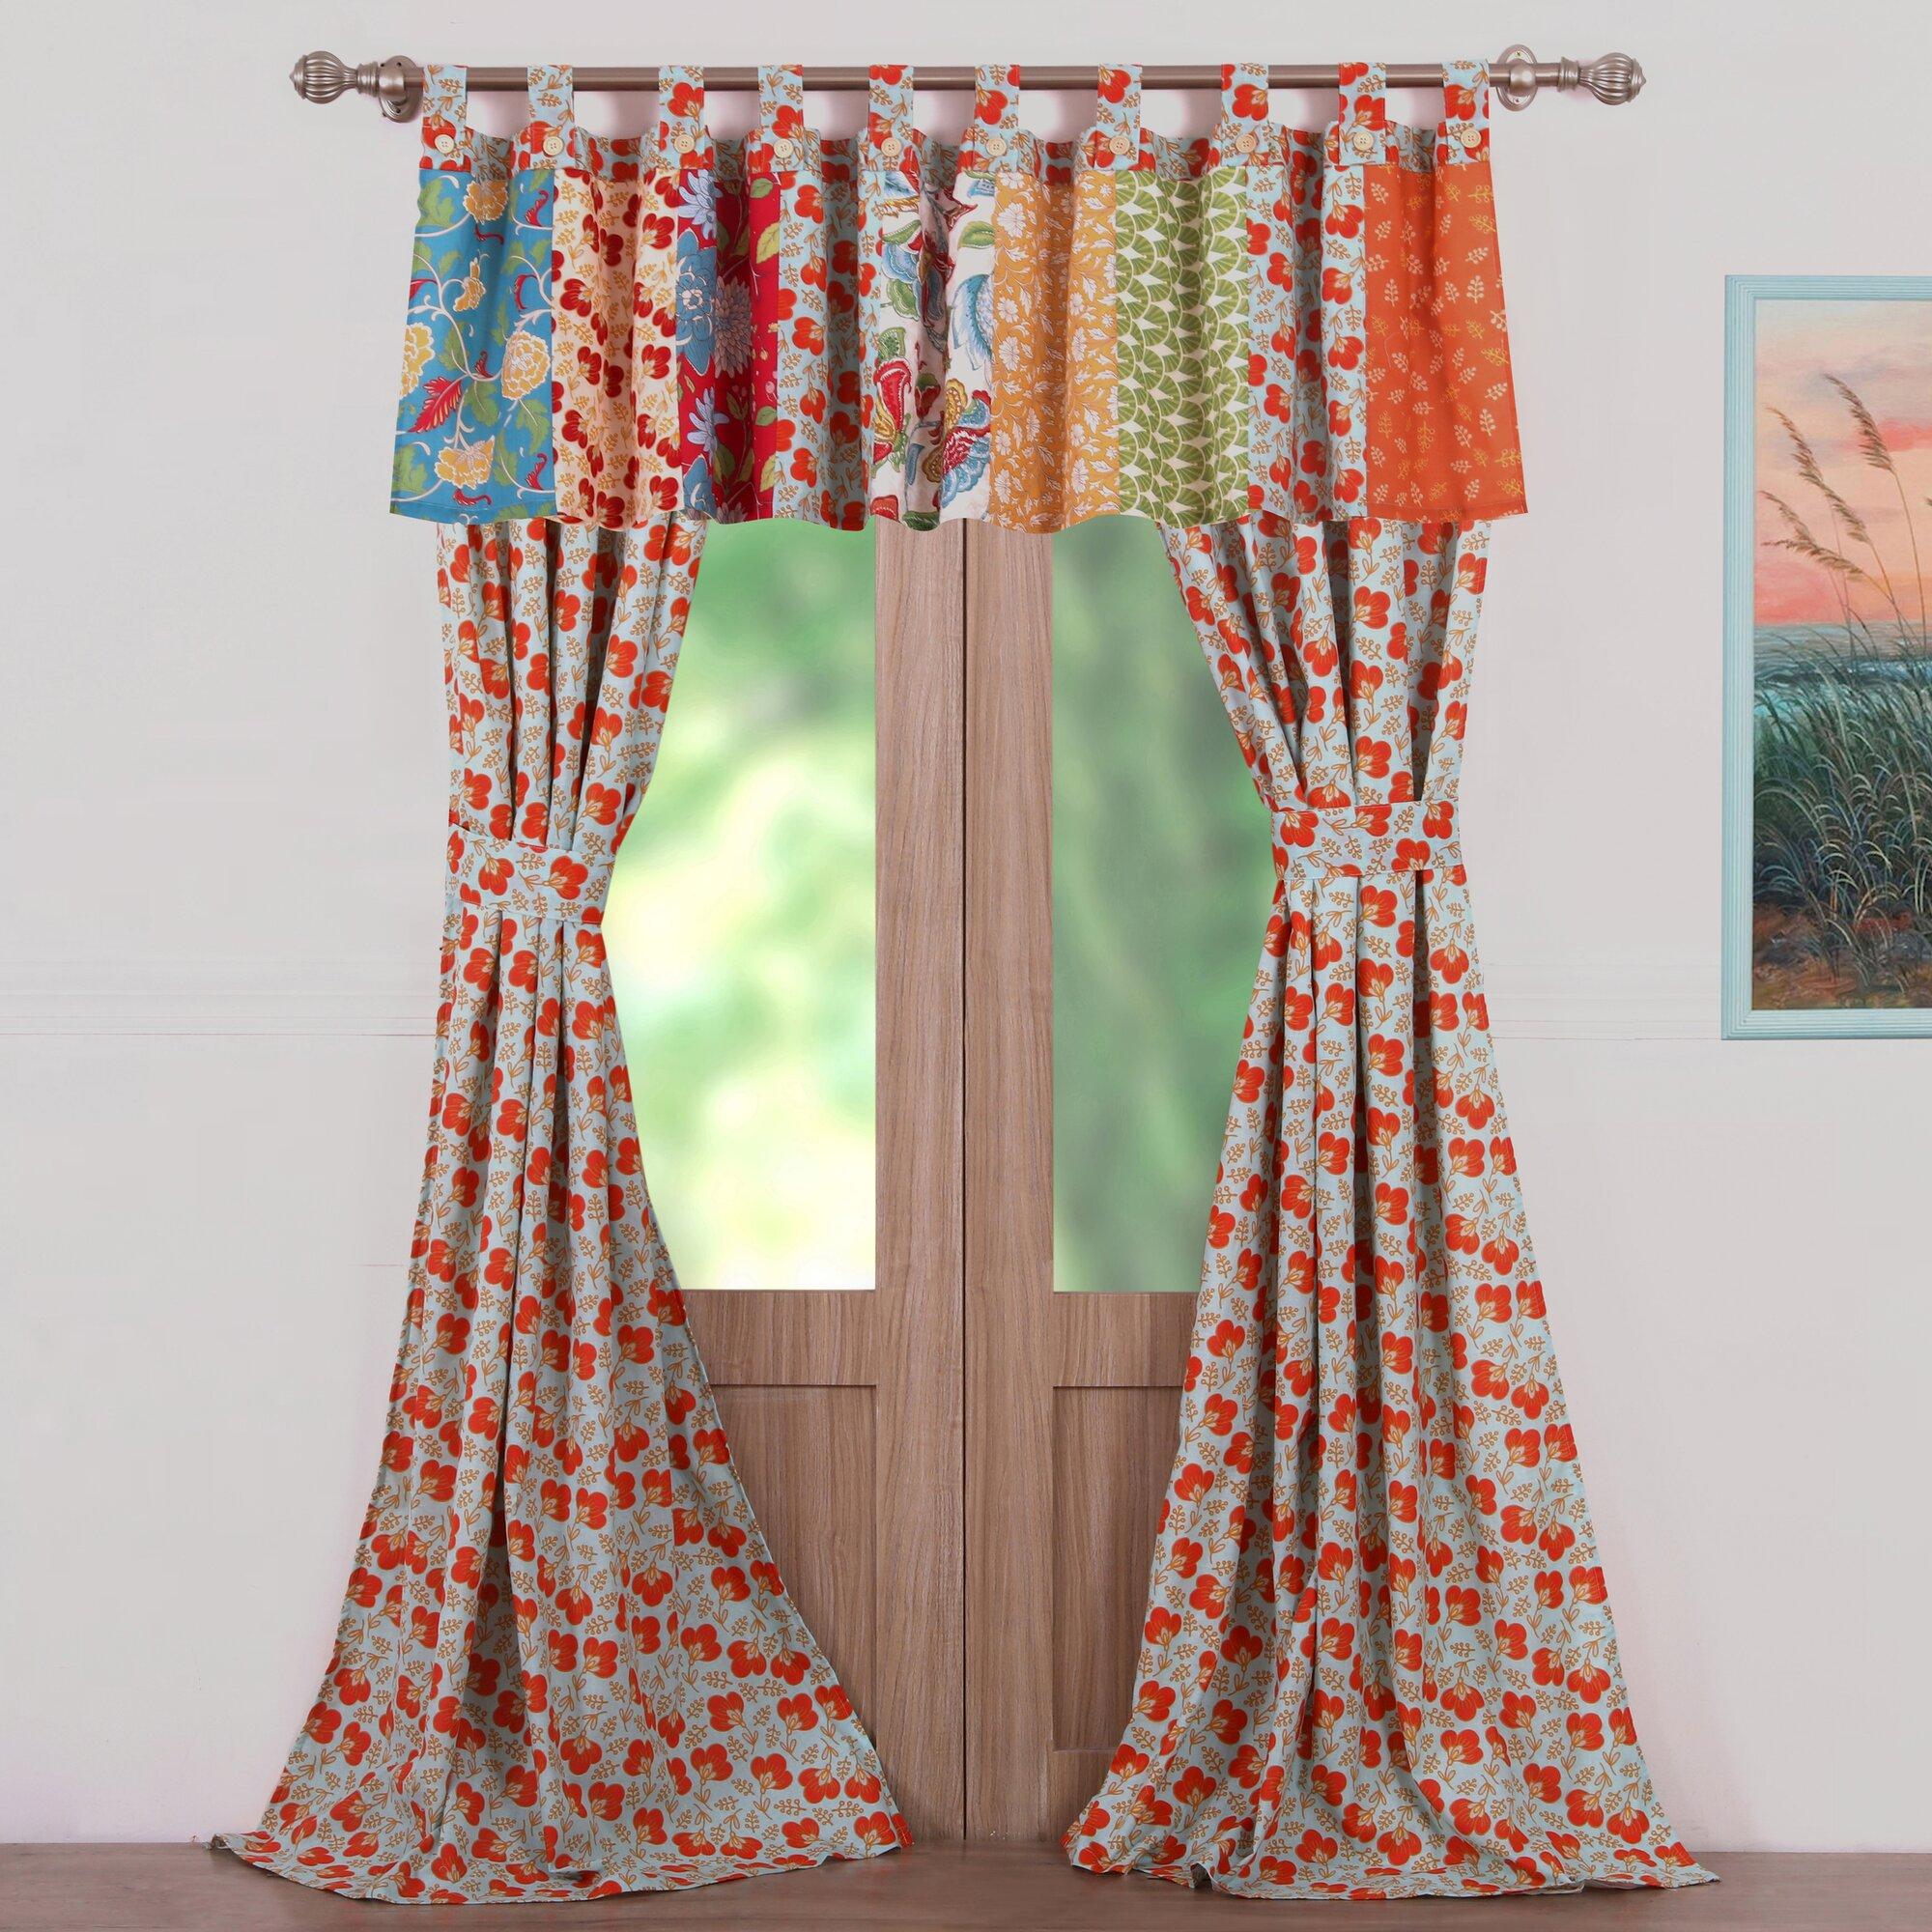 Greenland Home Fashions Terra Blossom Nature Floral Sheer Tab Top Curtain Panels Reviews